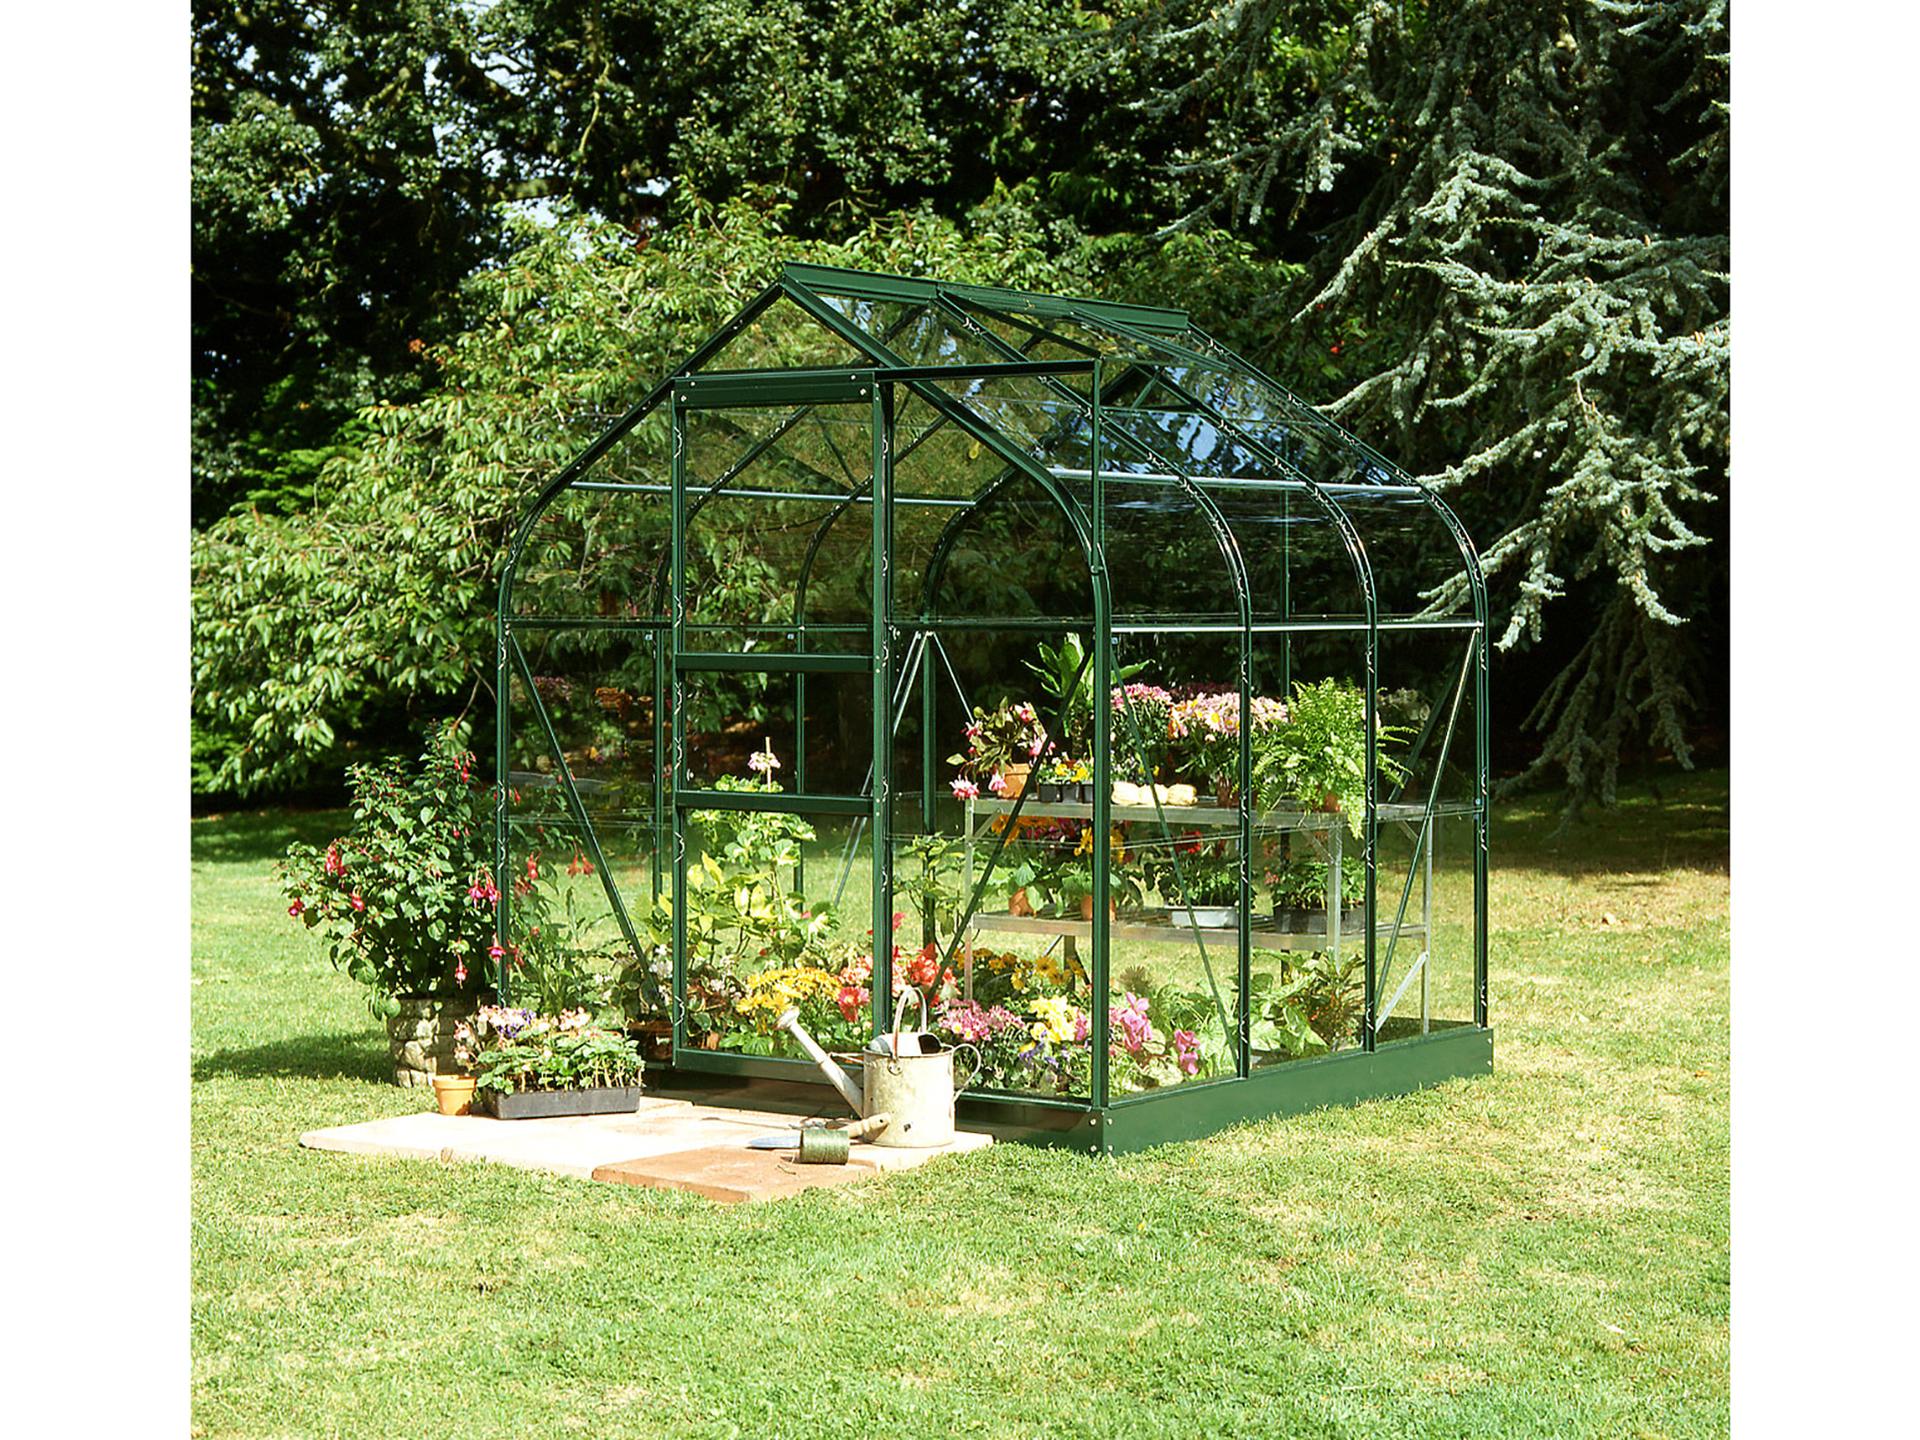 Royal well Serre de jardin Supreme 66 vert avec verre horticole